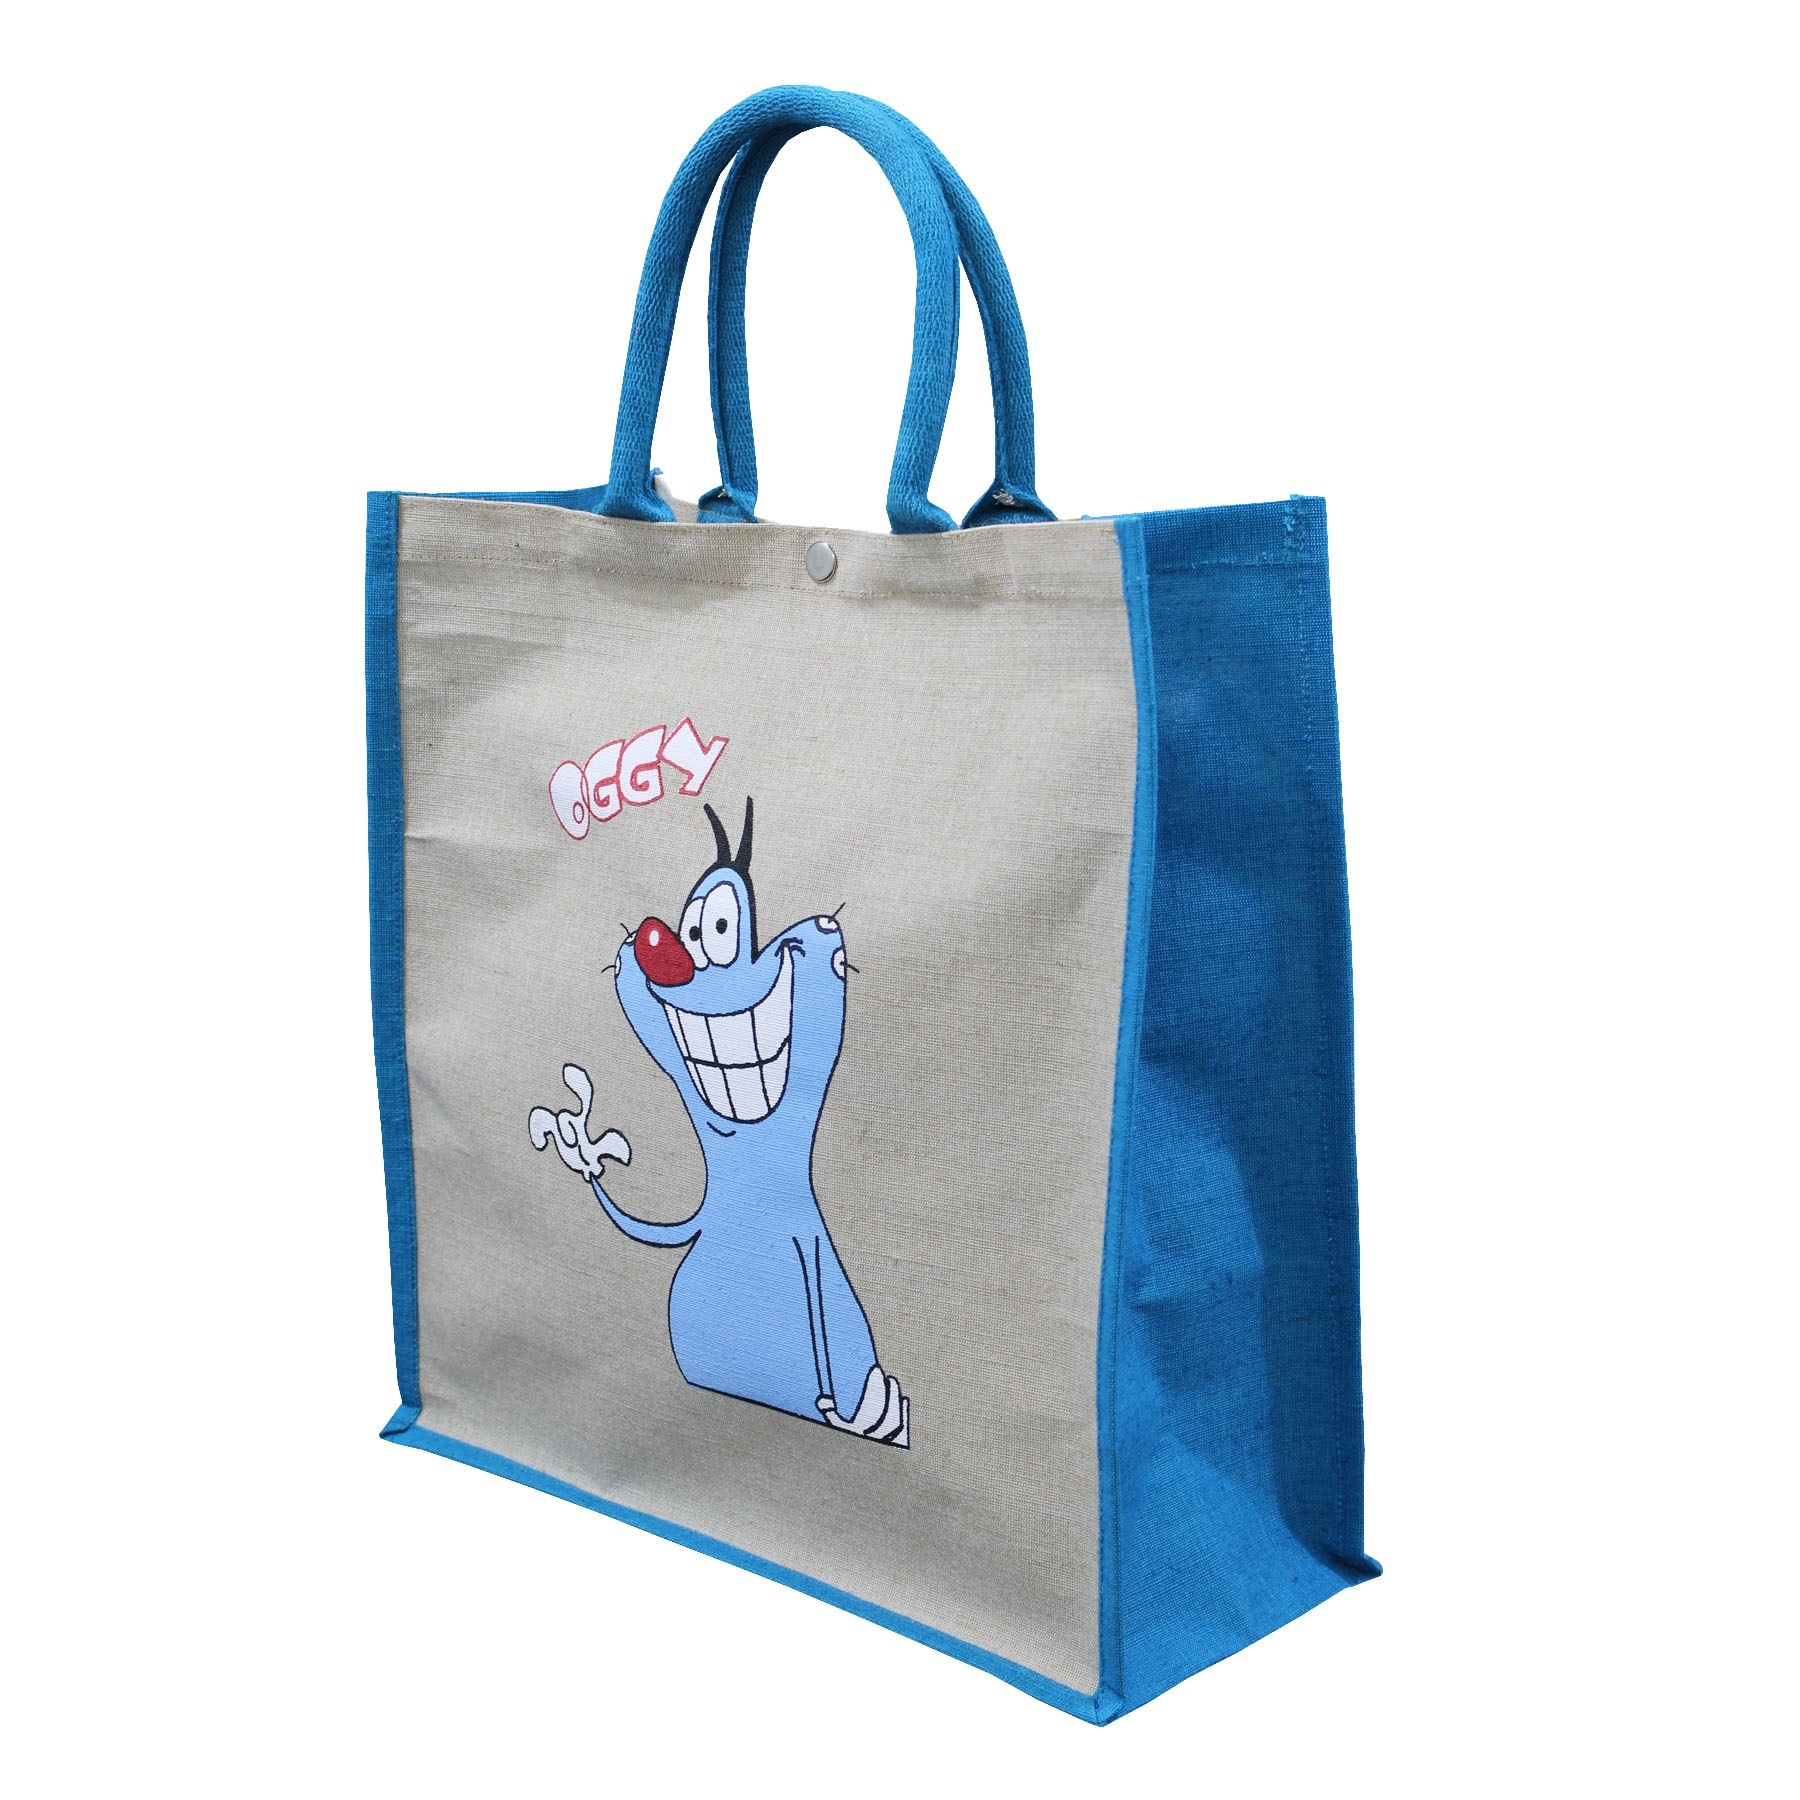 PP Laminated Juco Fabric Tote Bag